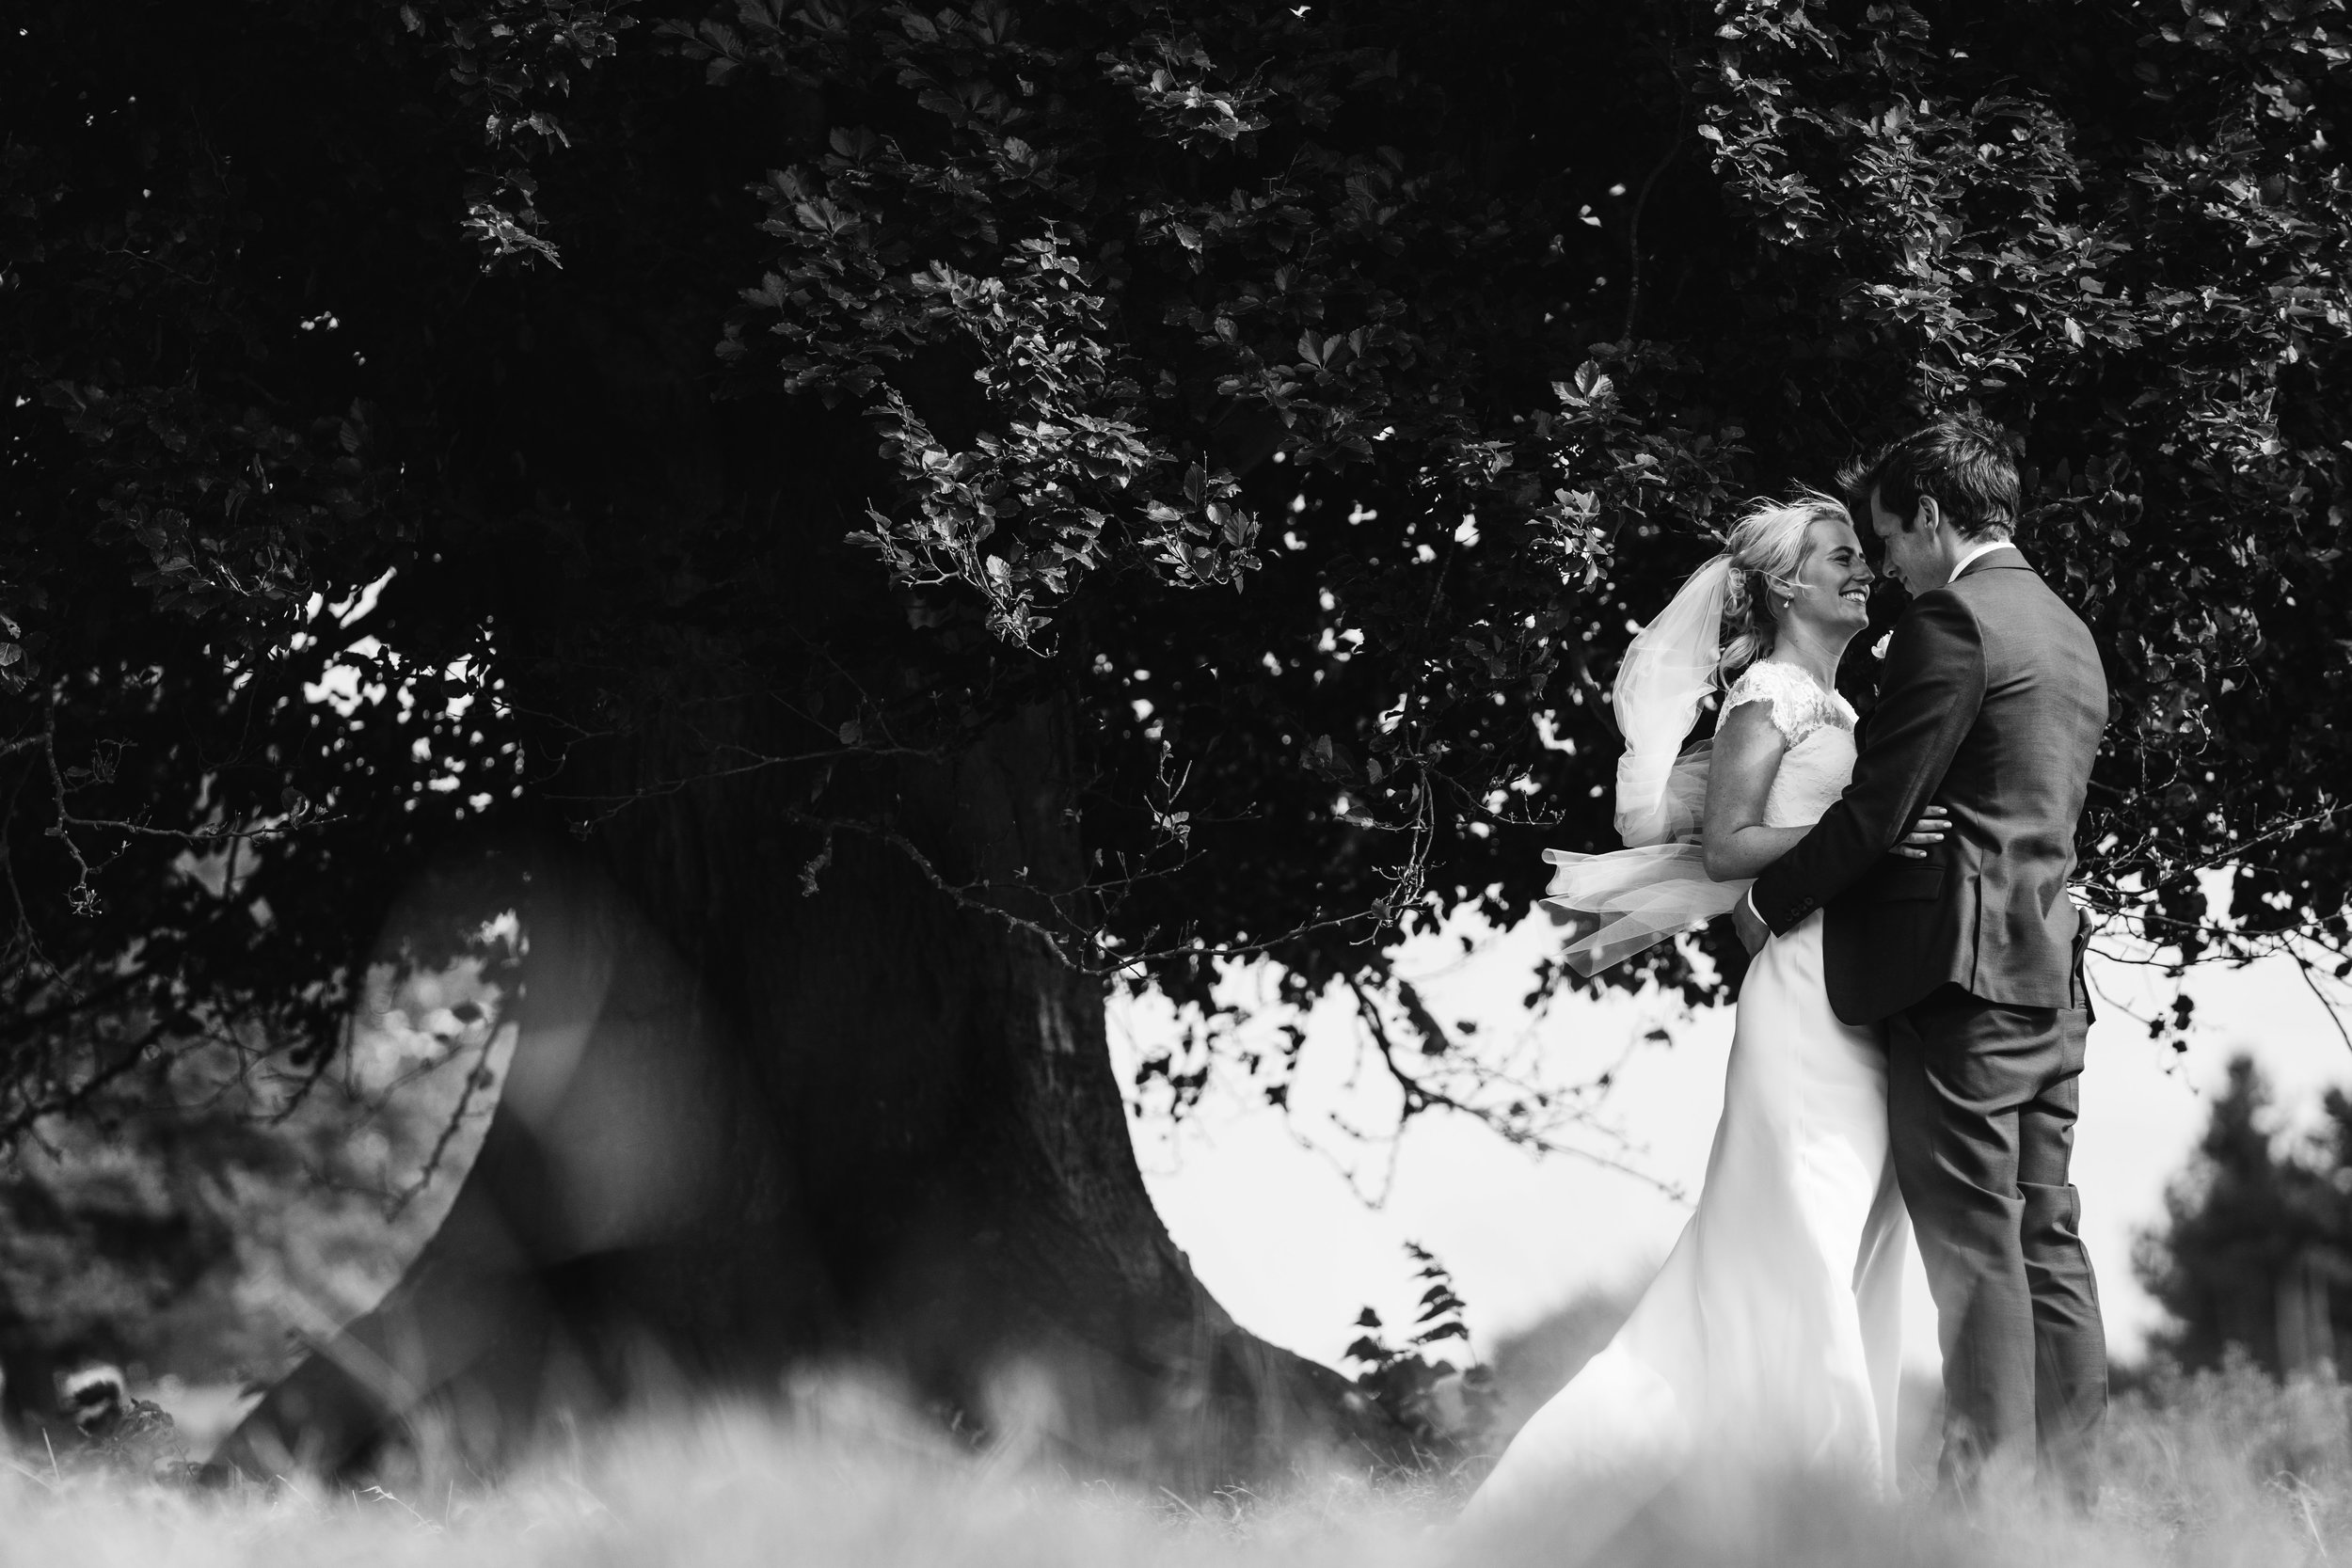 kent-wedding-photographer-209317.jpg